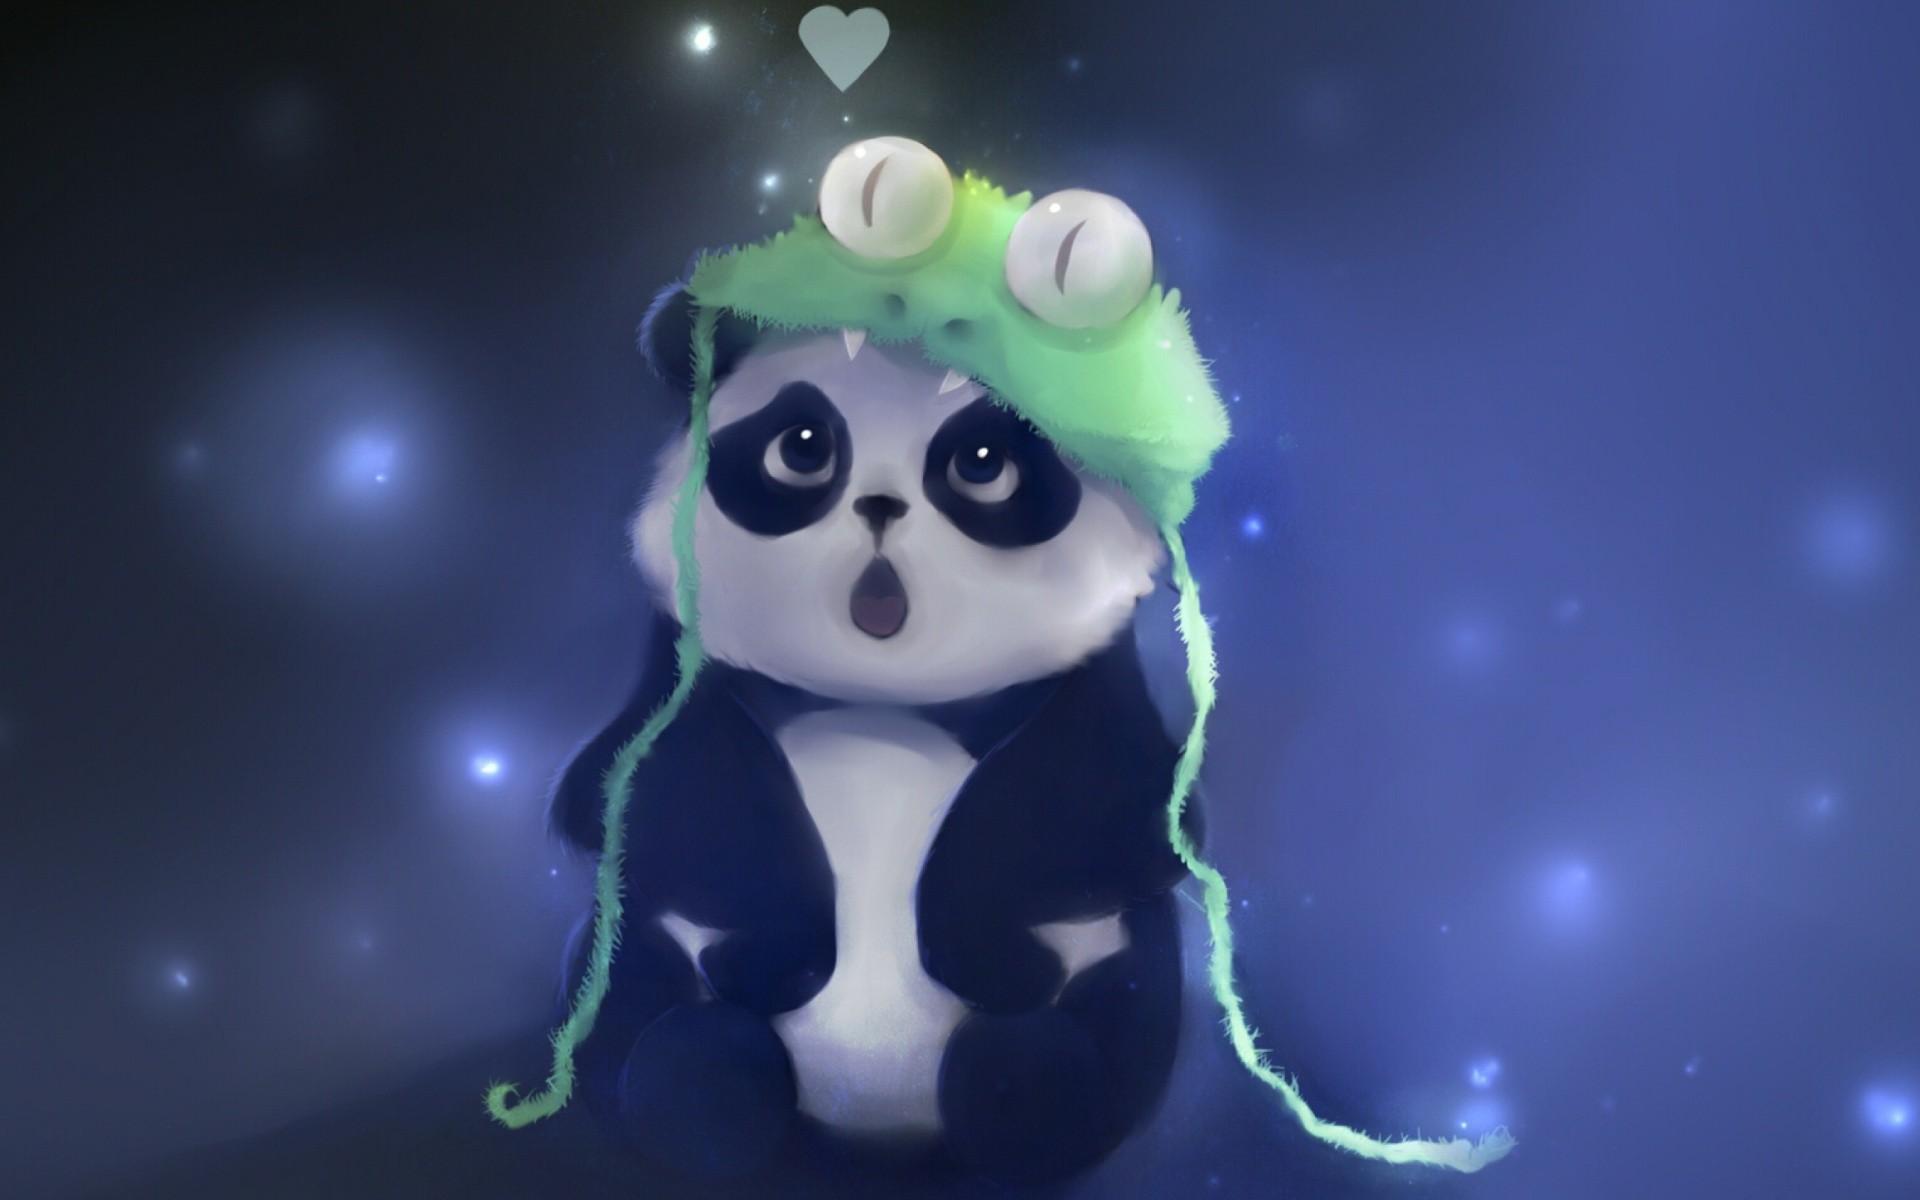 cute baby panda painting 1920×1200 baby panda wallpaper | Free Images